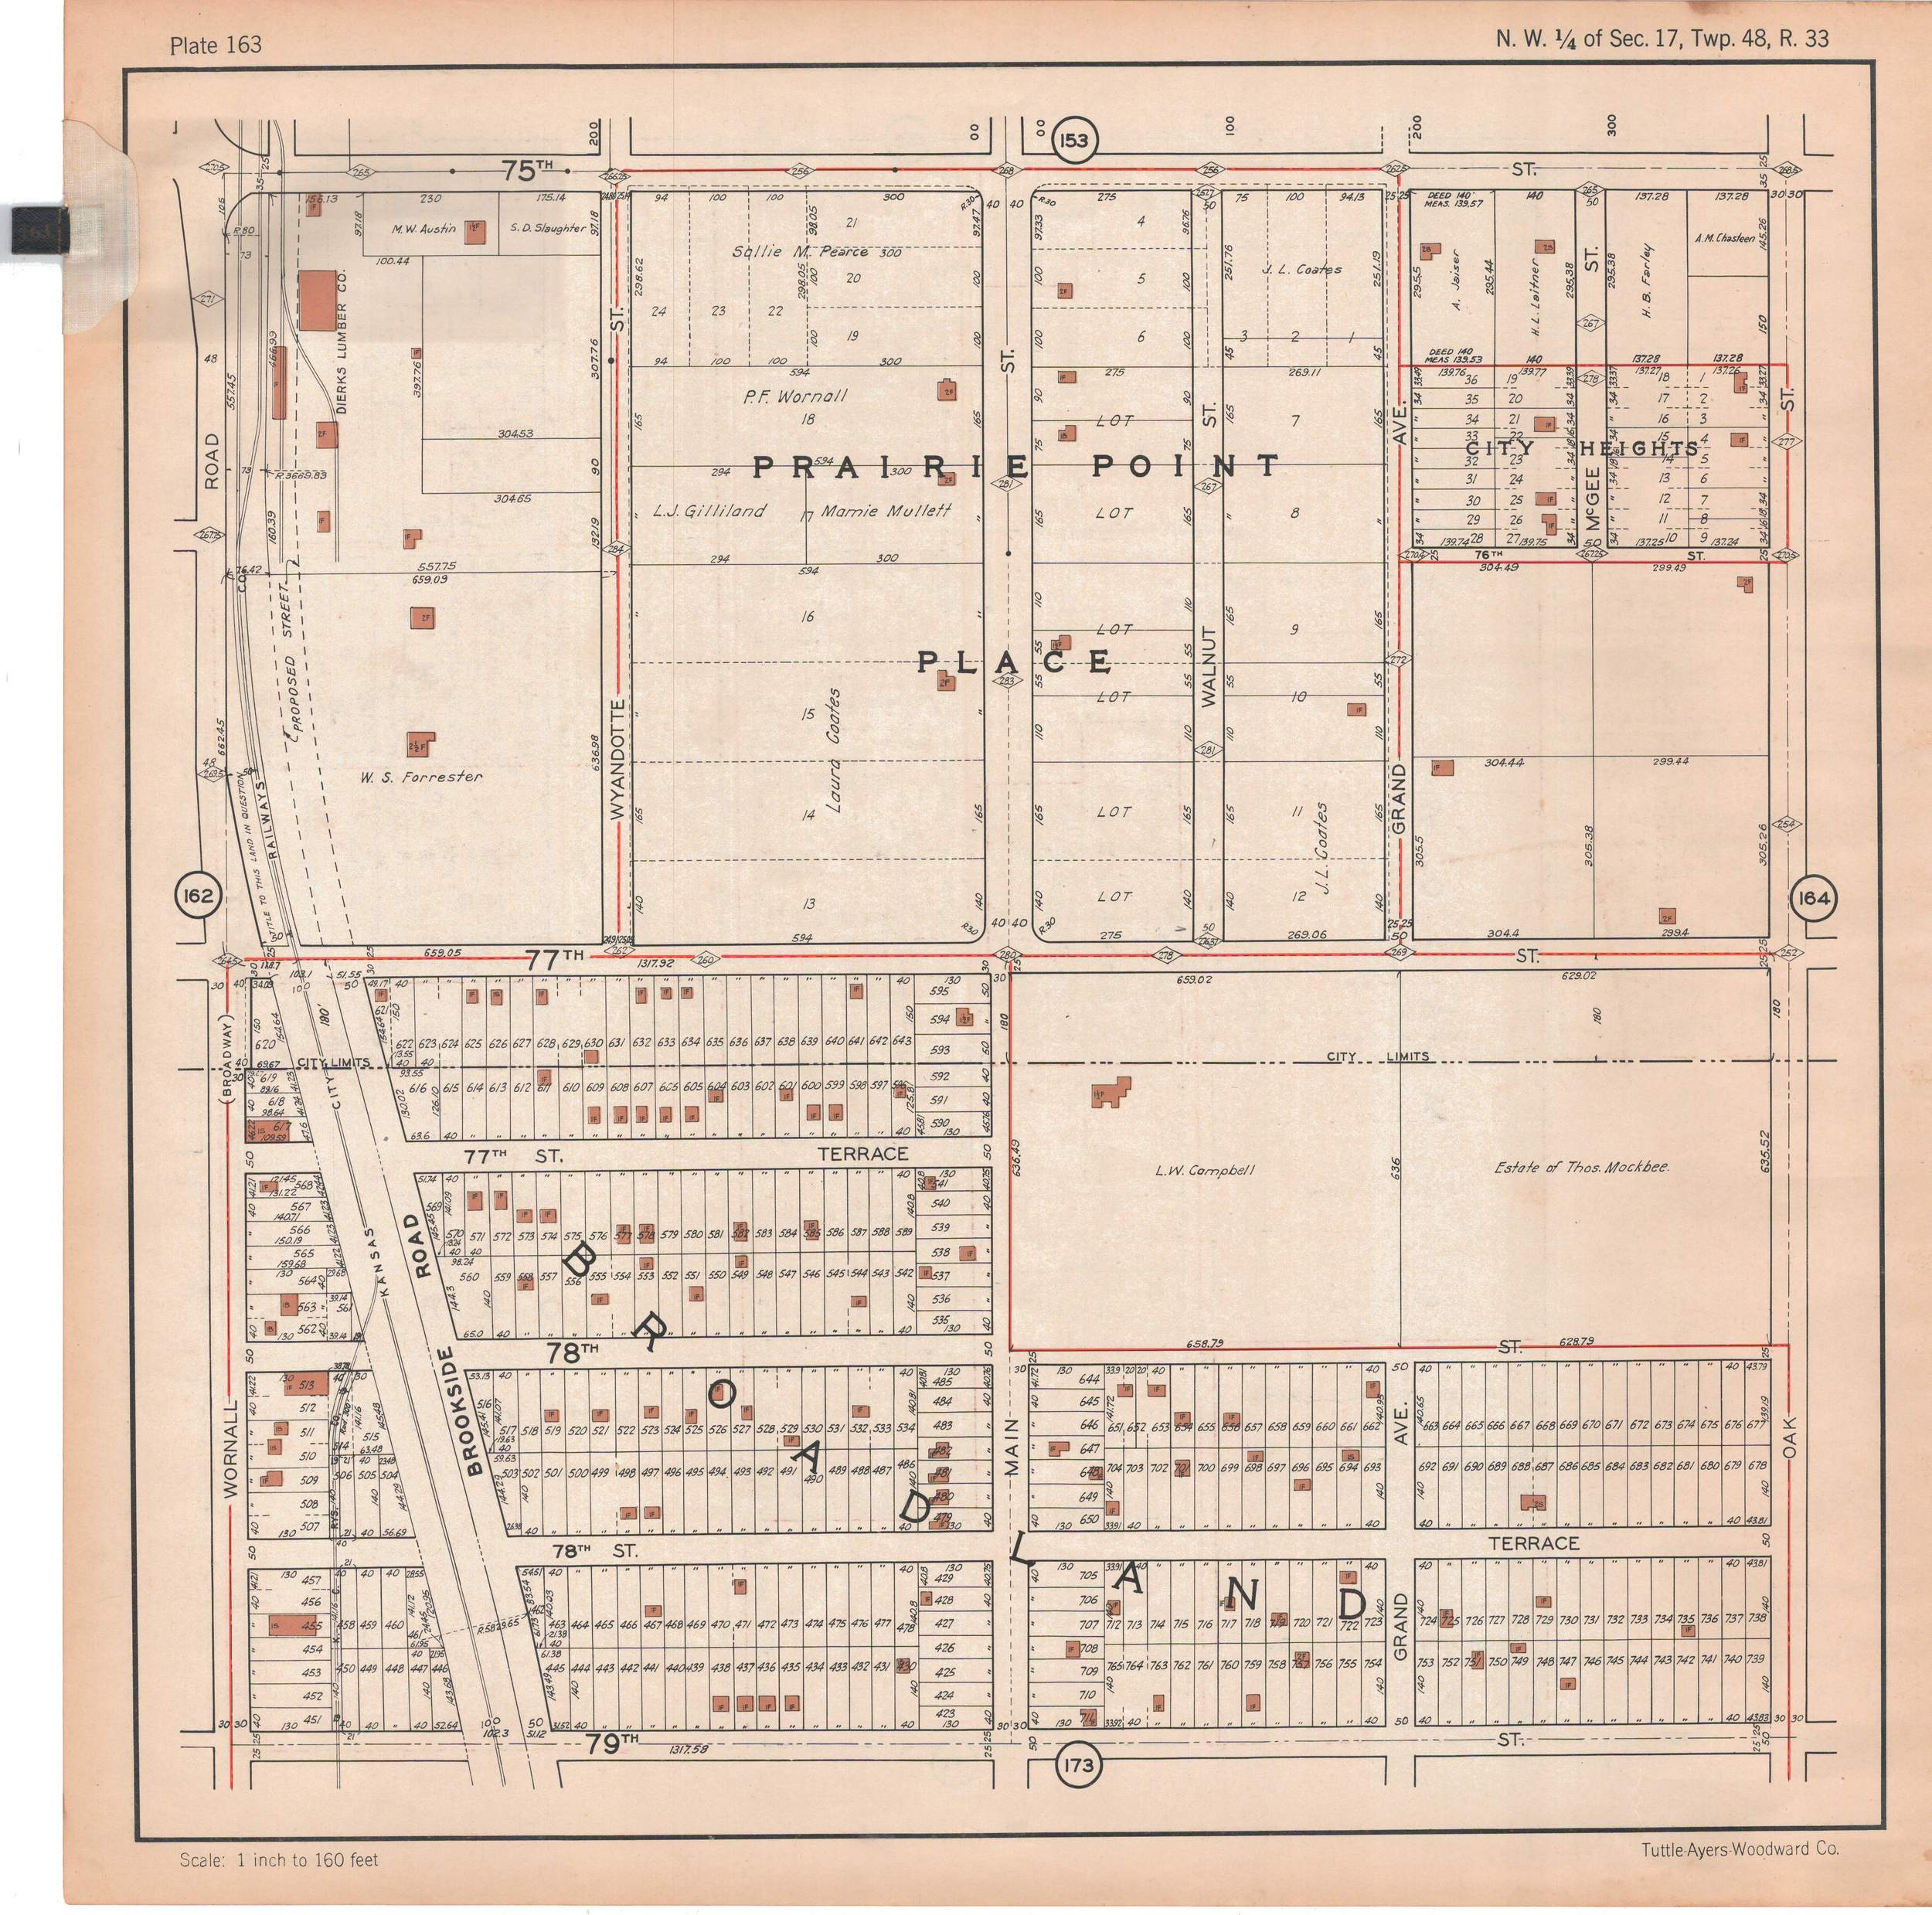 1925 TUTTLE_AYERS_Plate_163.JPG